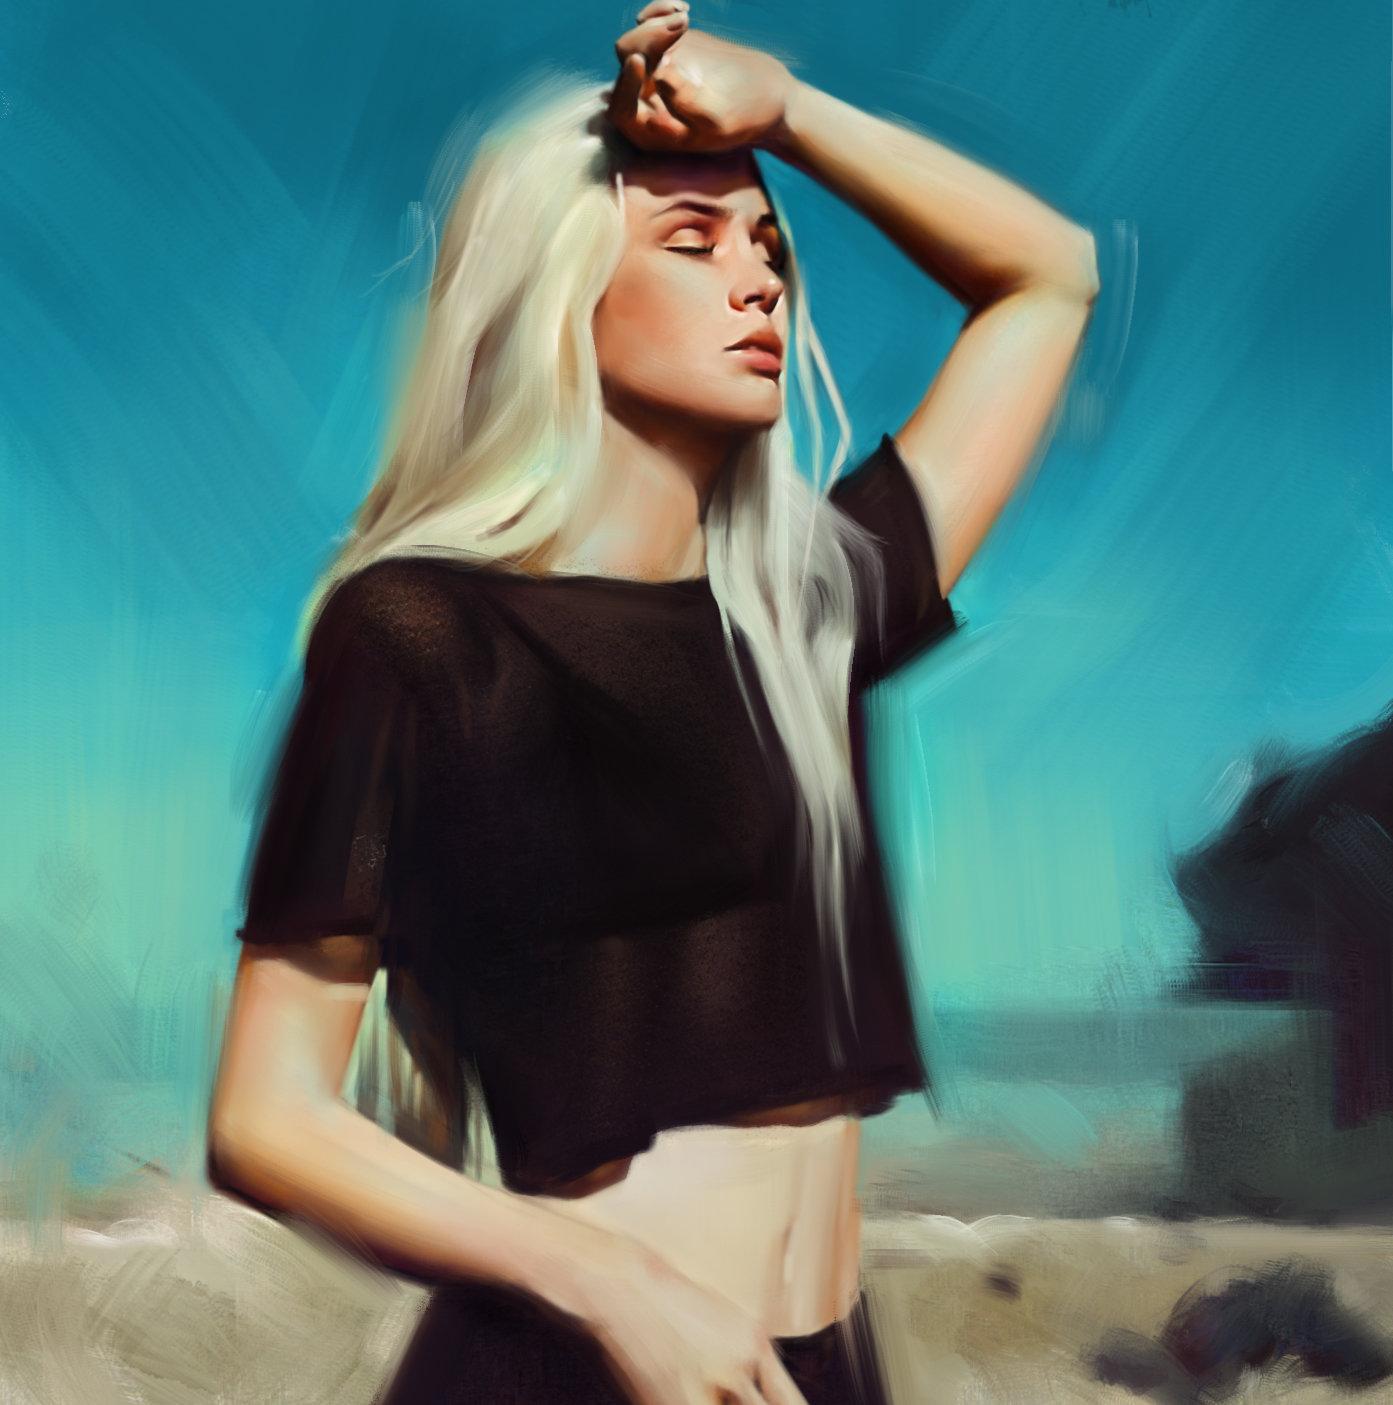 Concept Art By Daniel Bolling Walsh